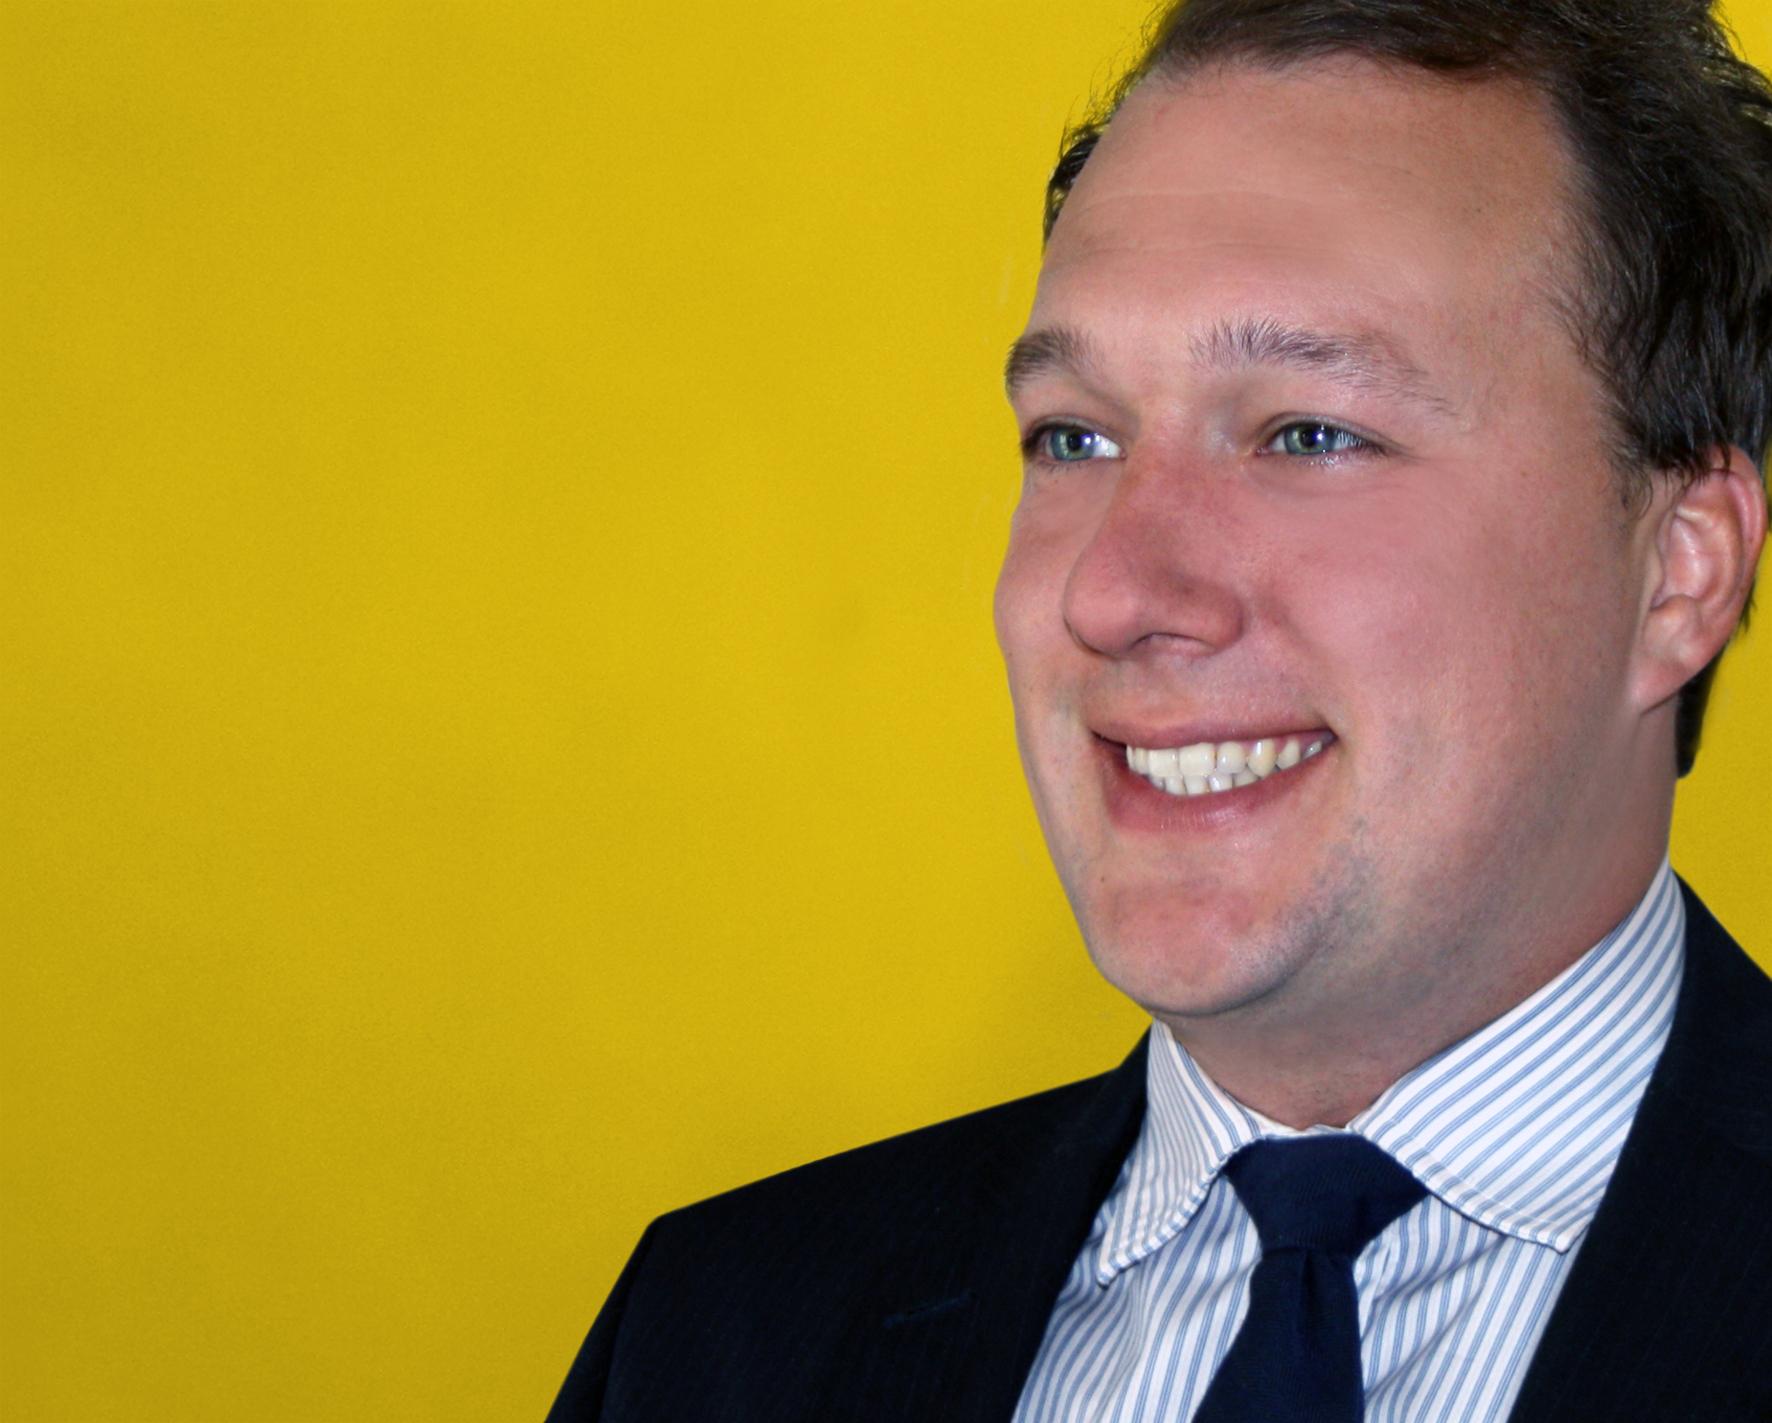 Ben Lawson, Associate at Flint Bishop